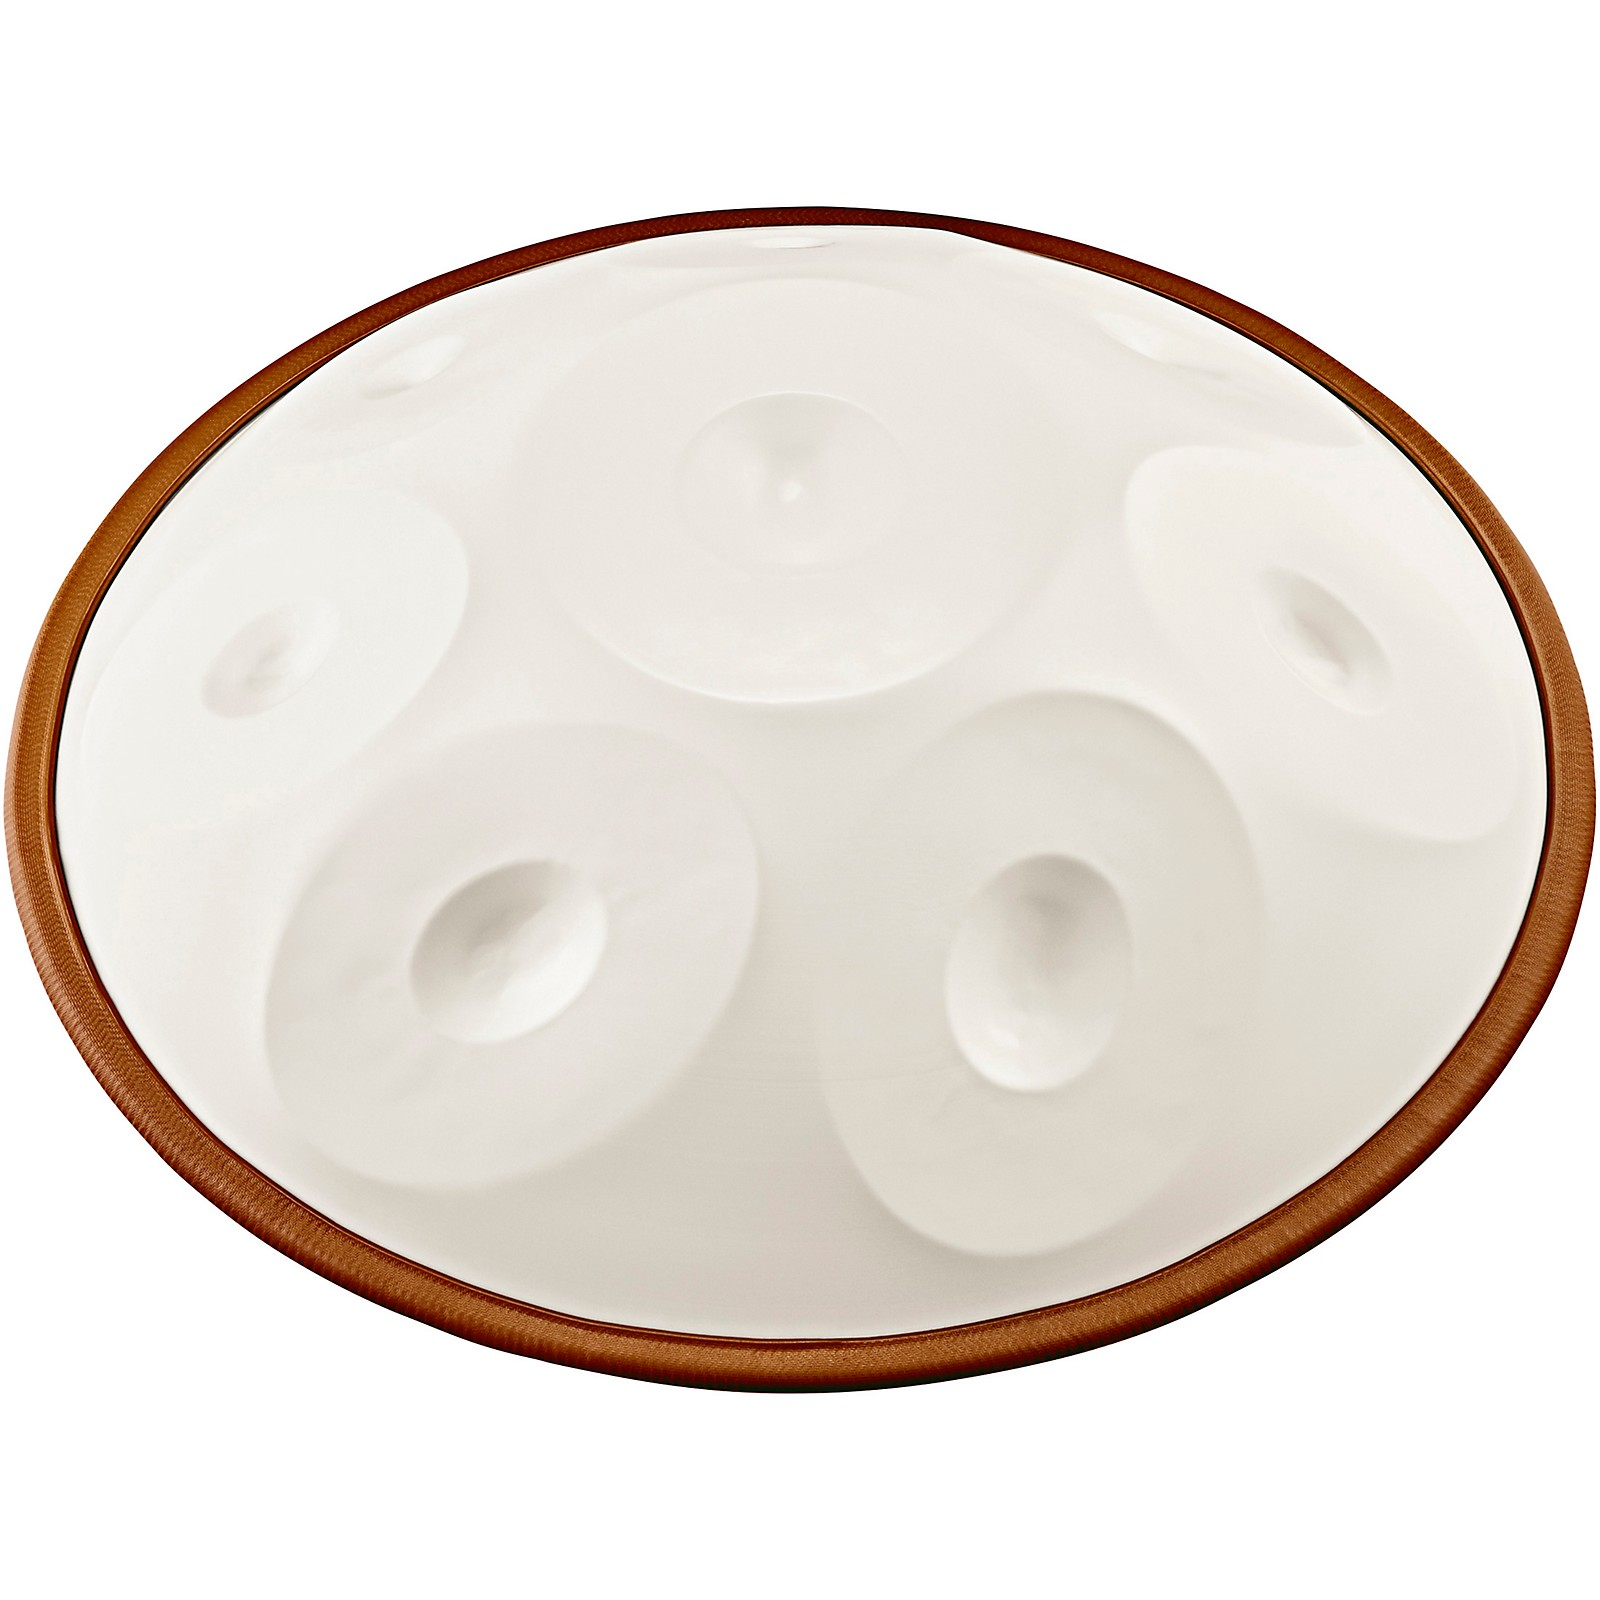 Meinl Sonic Energy Harmonic Art Handpan in White Jade, Akebono F